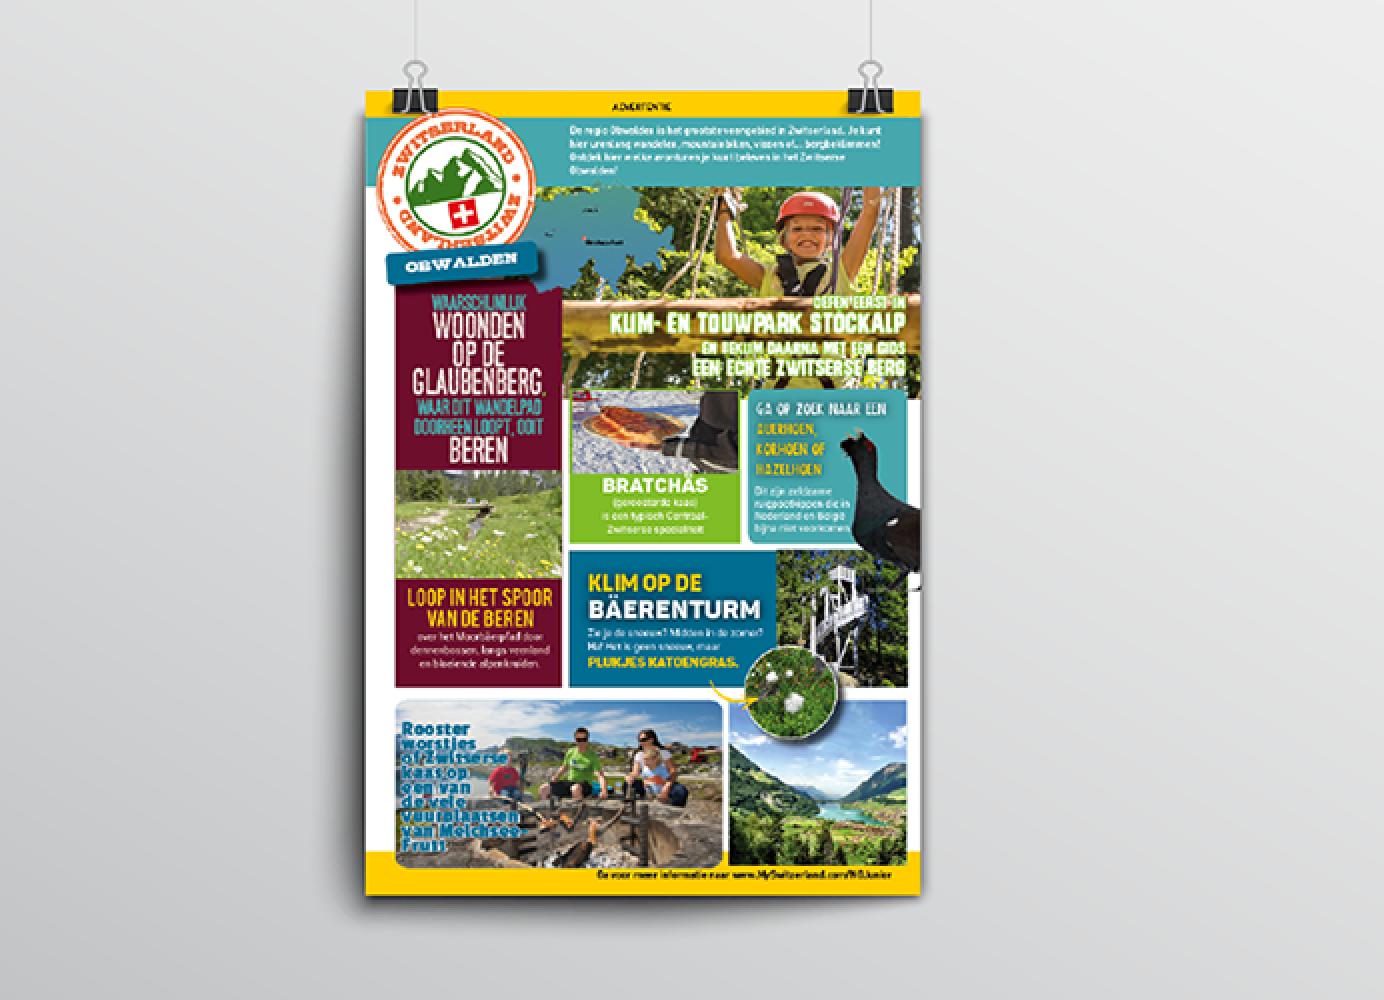 Advertentie Zwitserland Toerisme voor de regio Obwalden